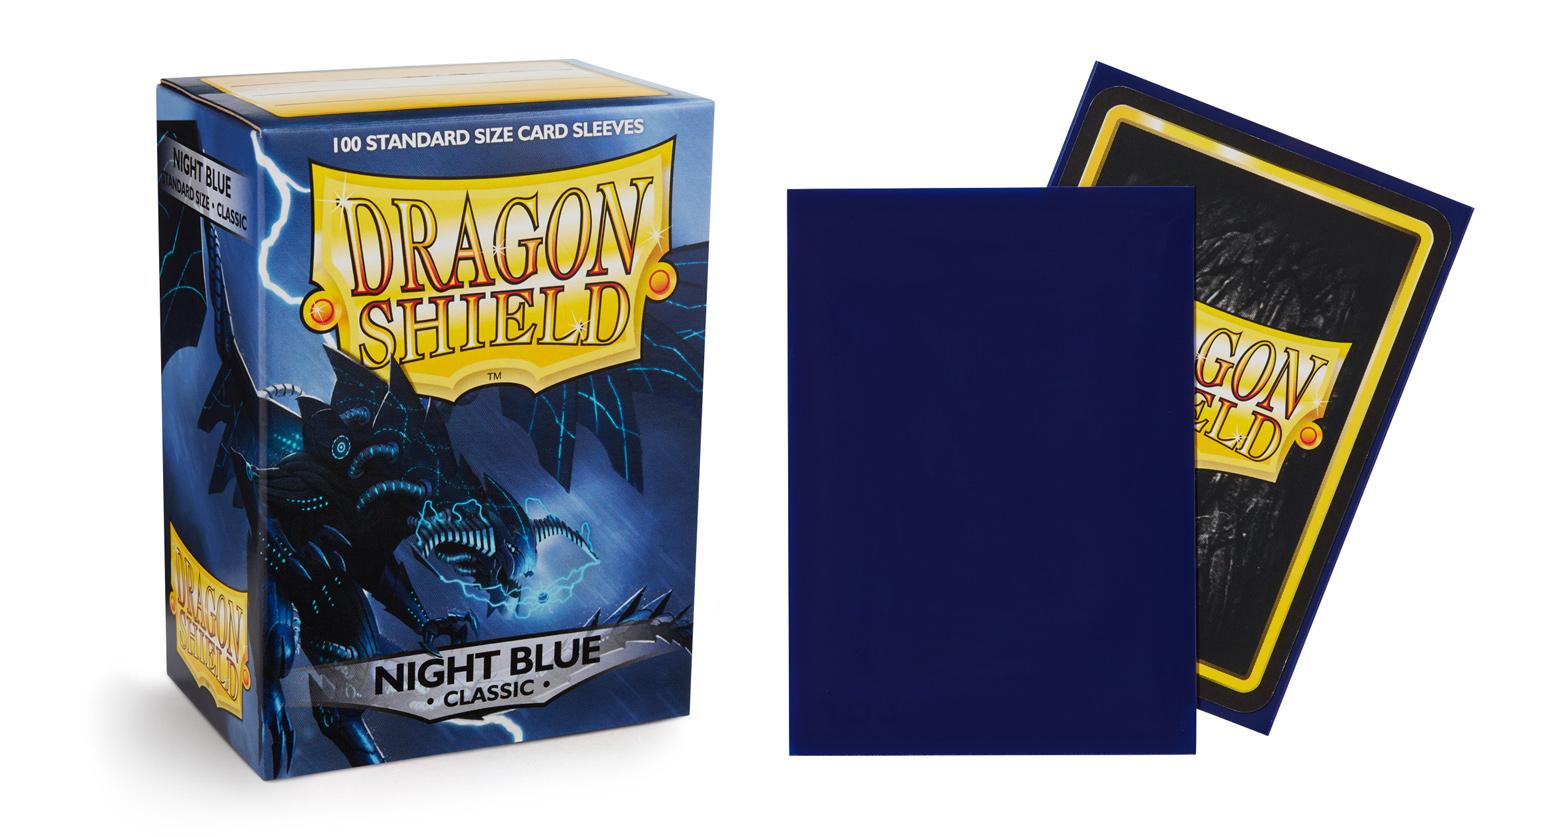 Dragon Shield: Classic NIGHT BLUE (100 ct.)